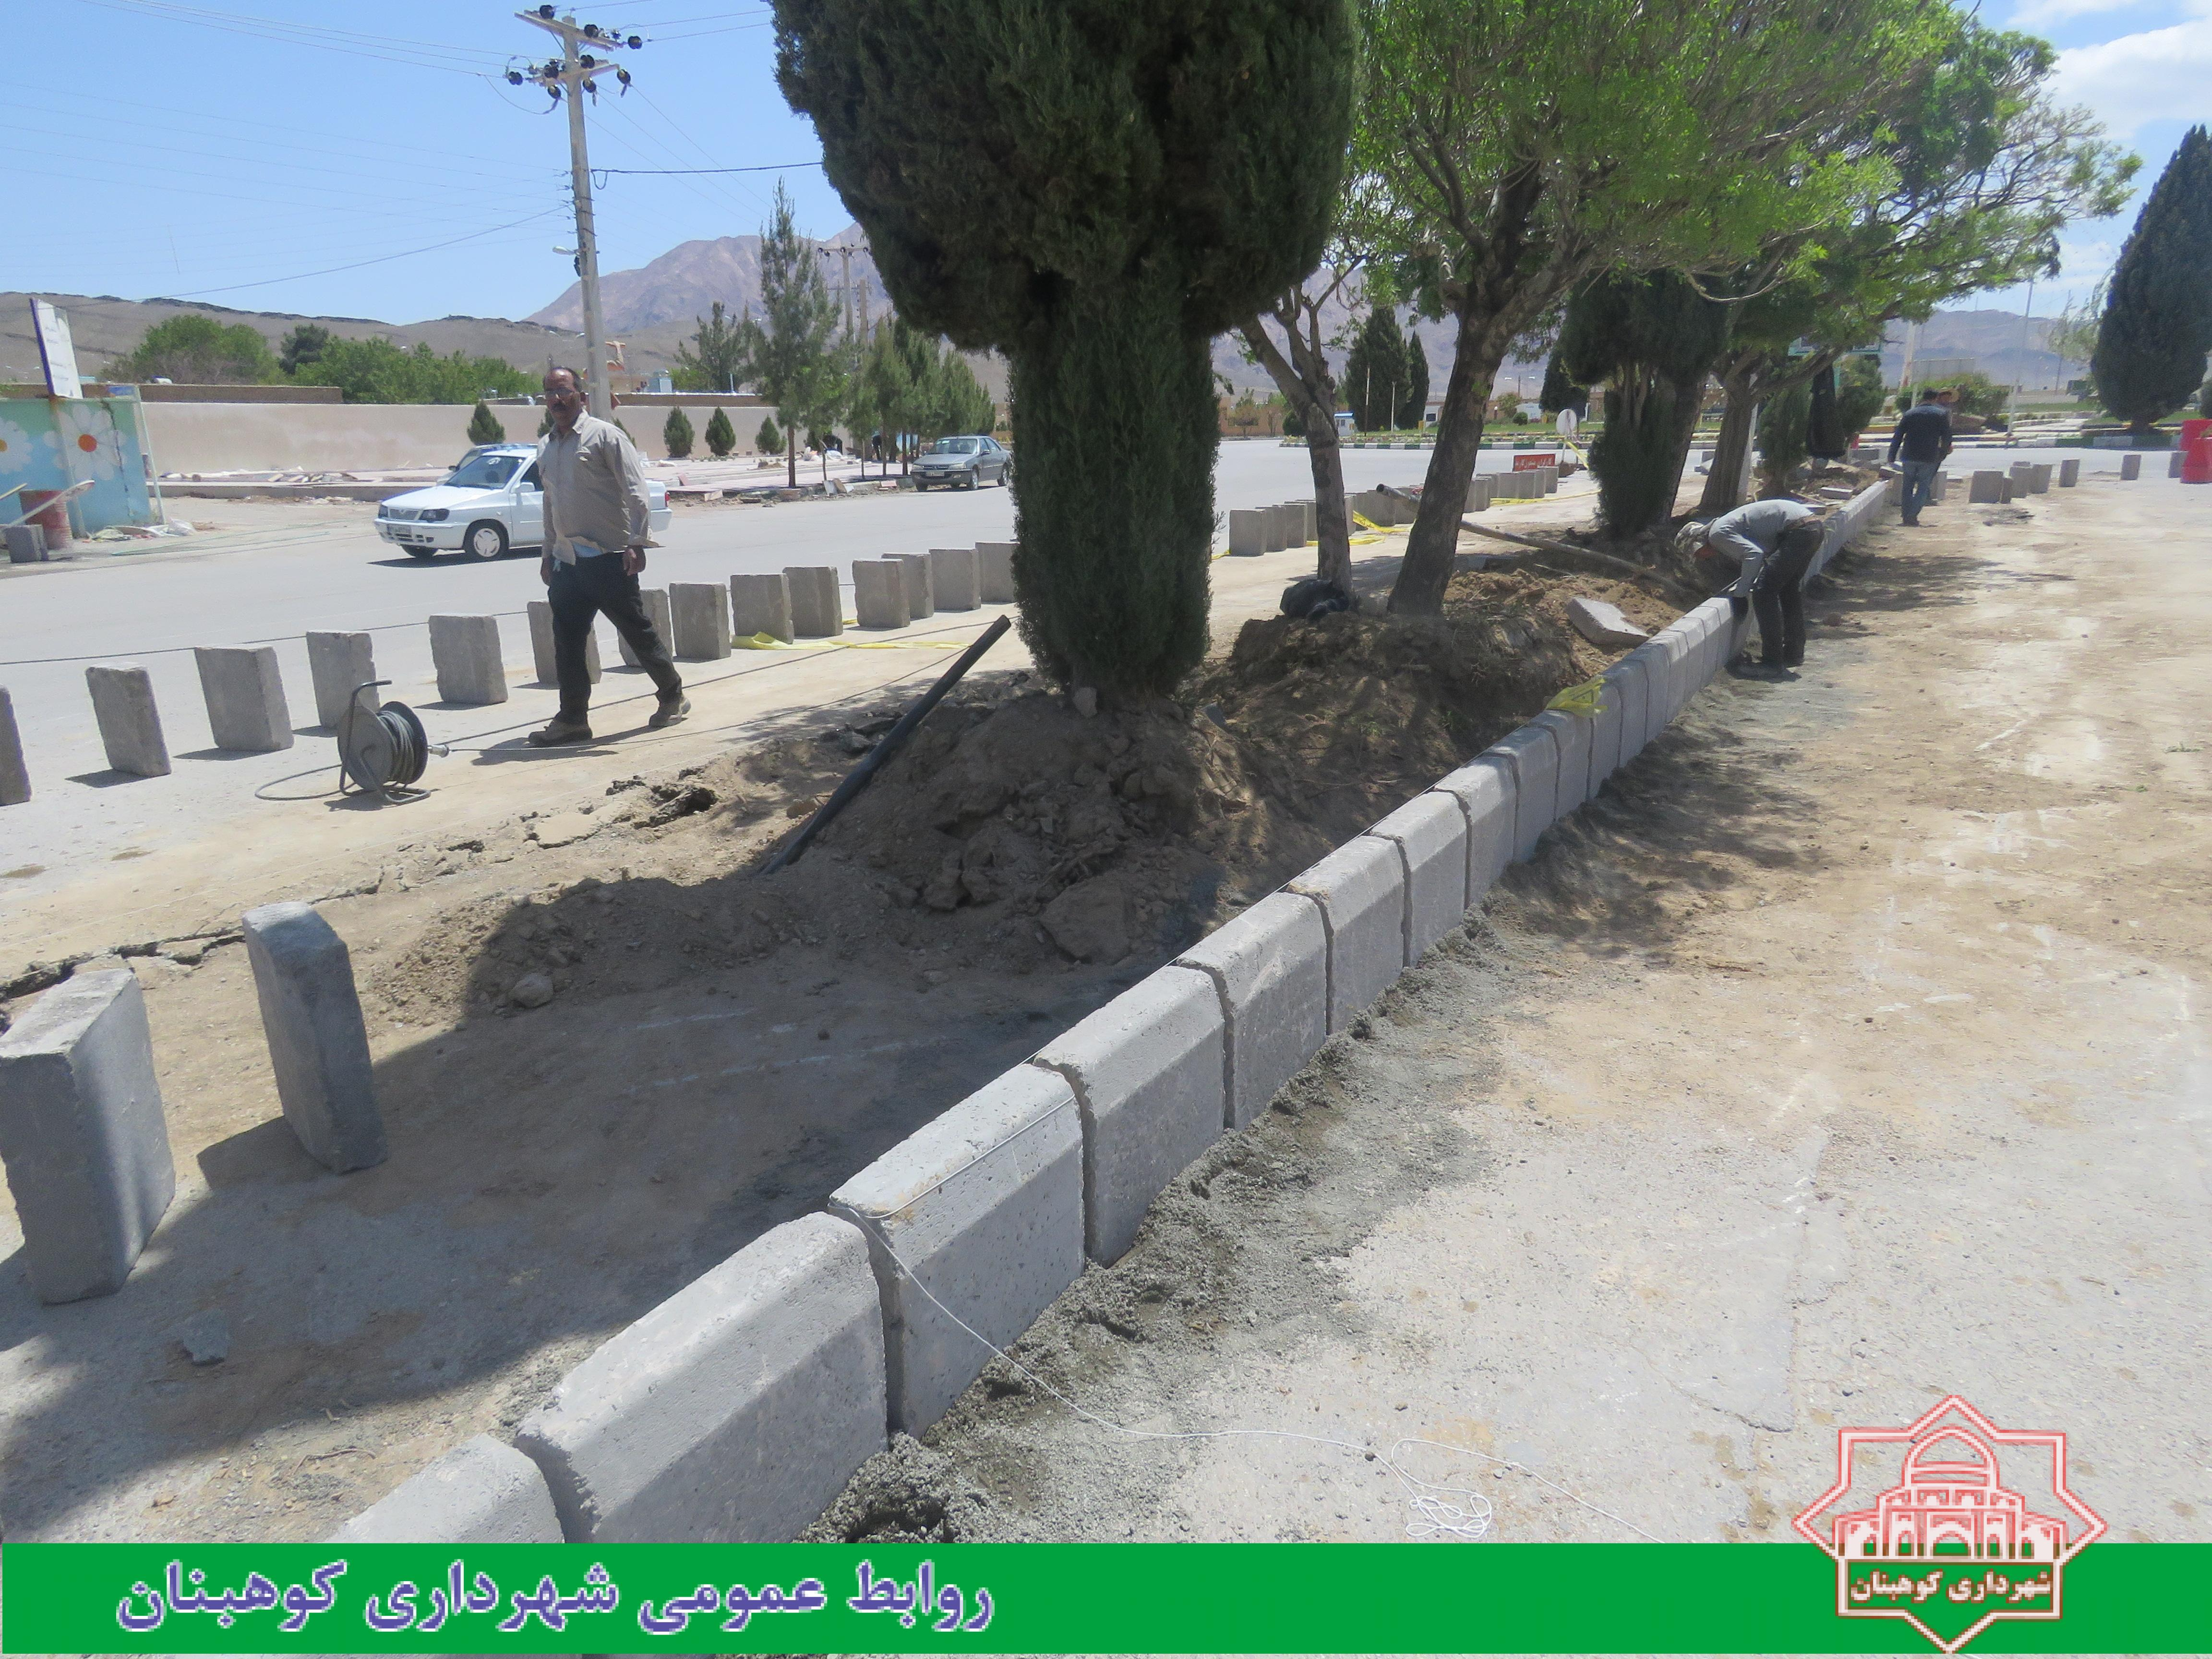 اجرای عملیات تعویض جداول ورودی بلوار آزادی و ساخت لچکی